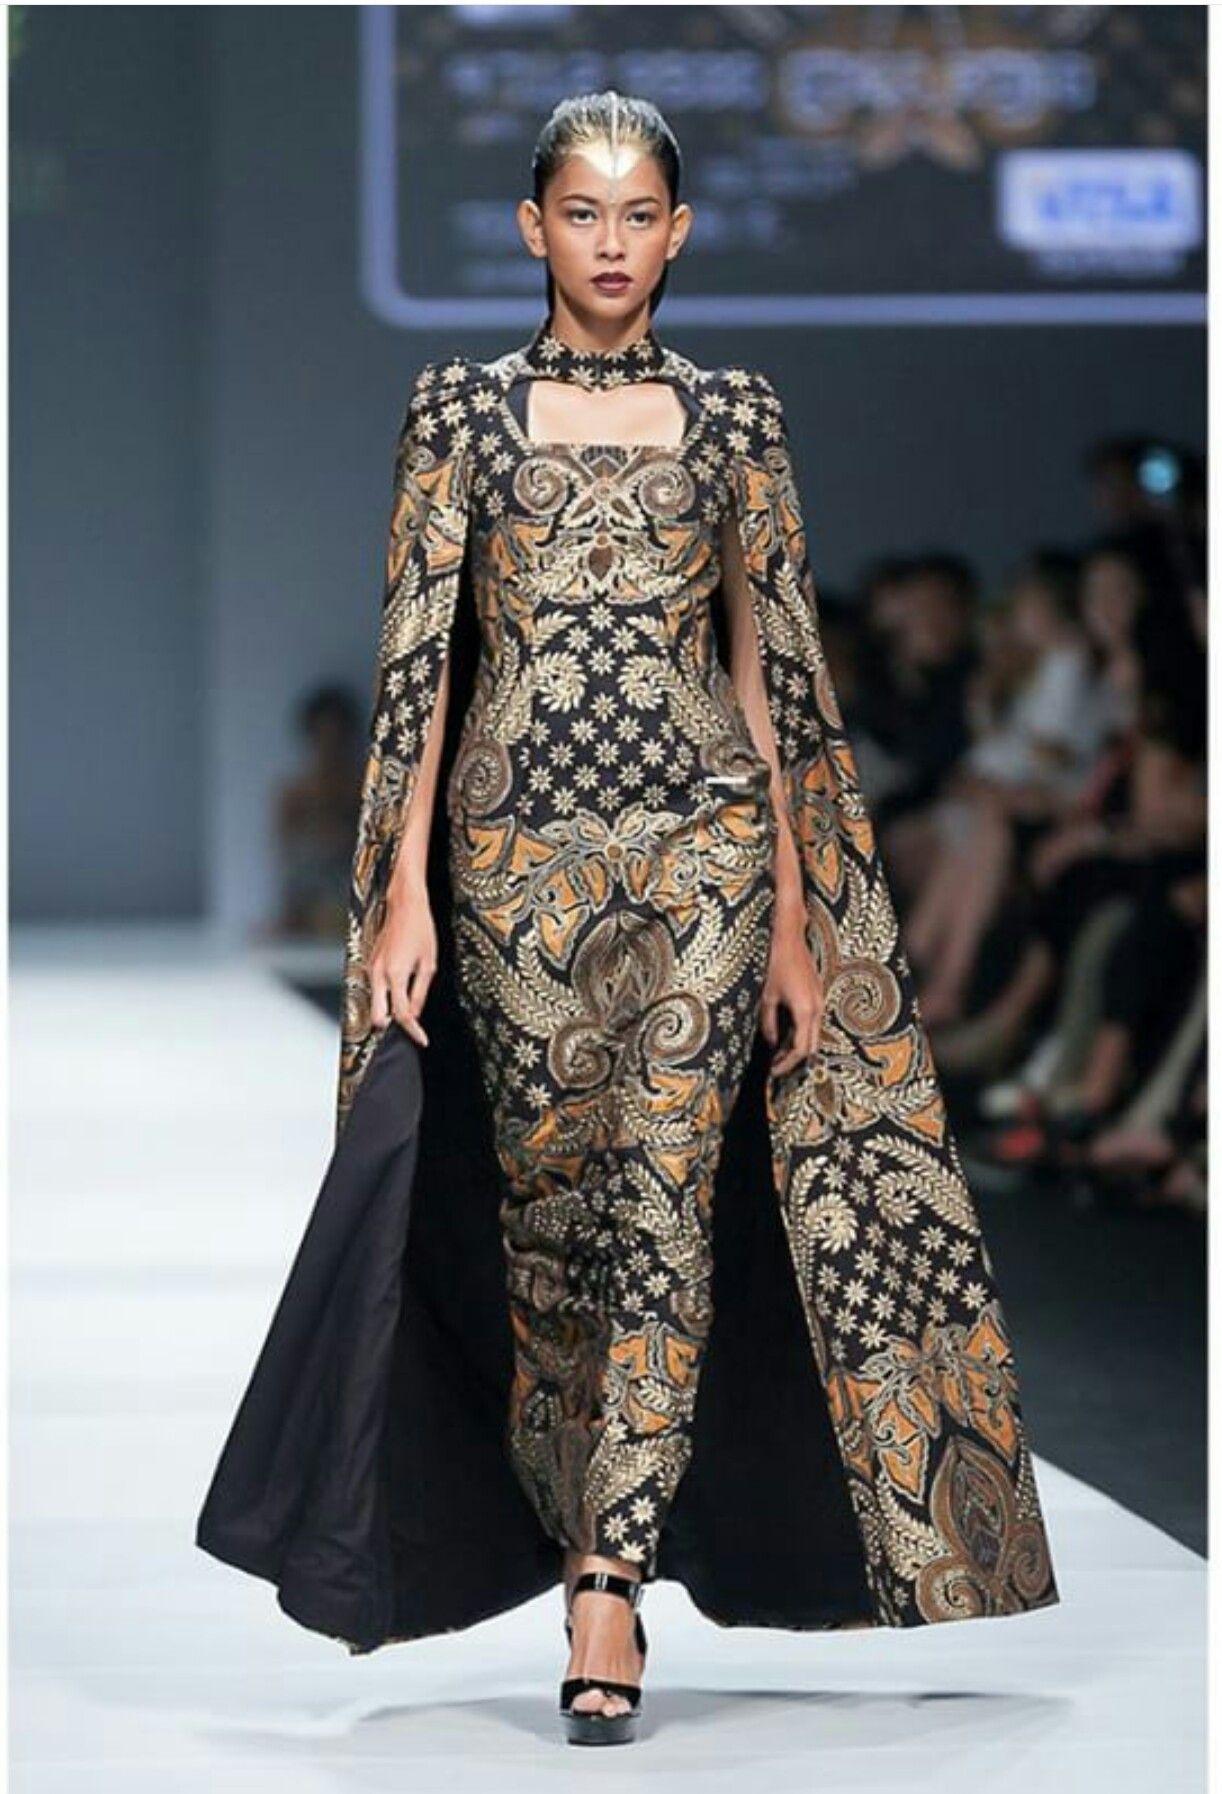 Gaun batik fashion show